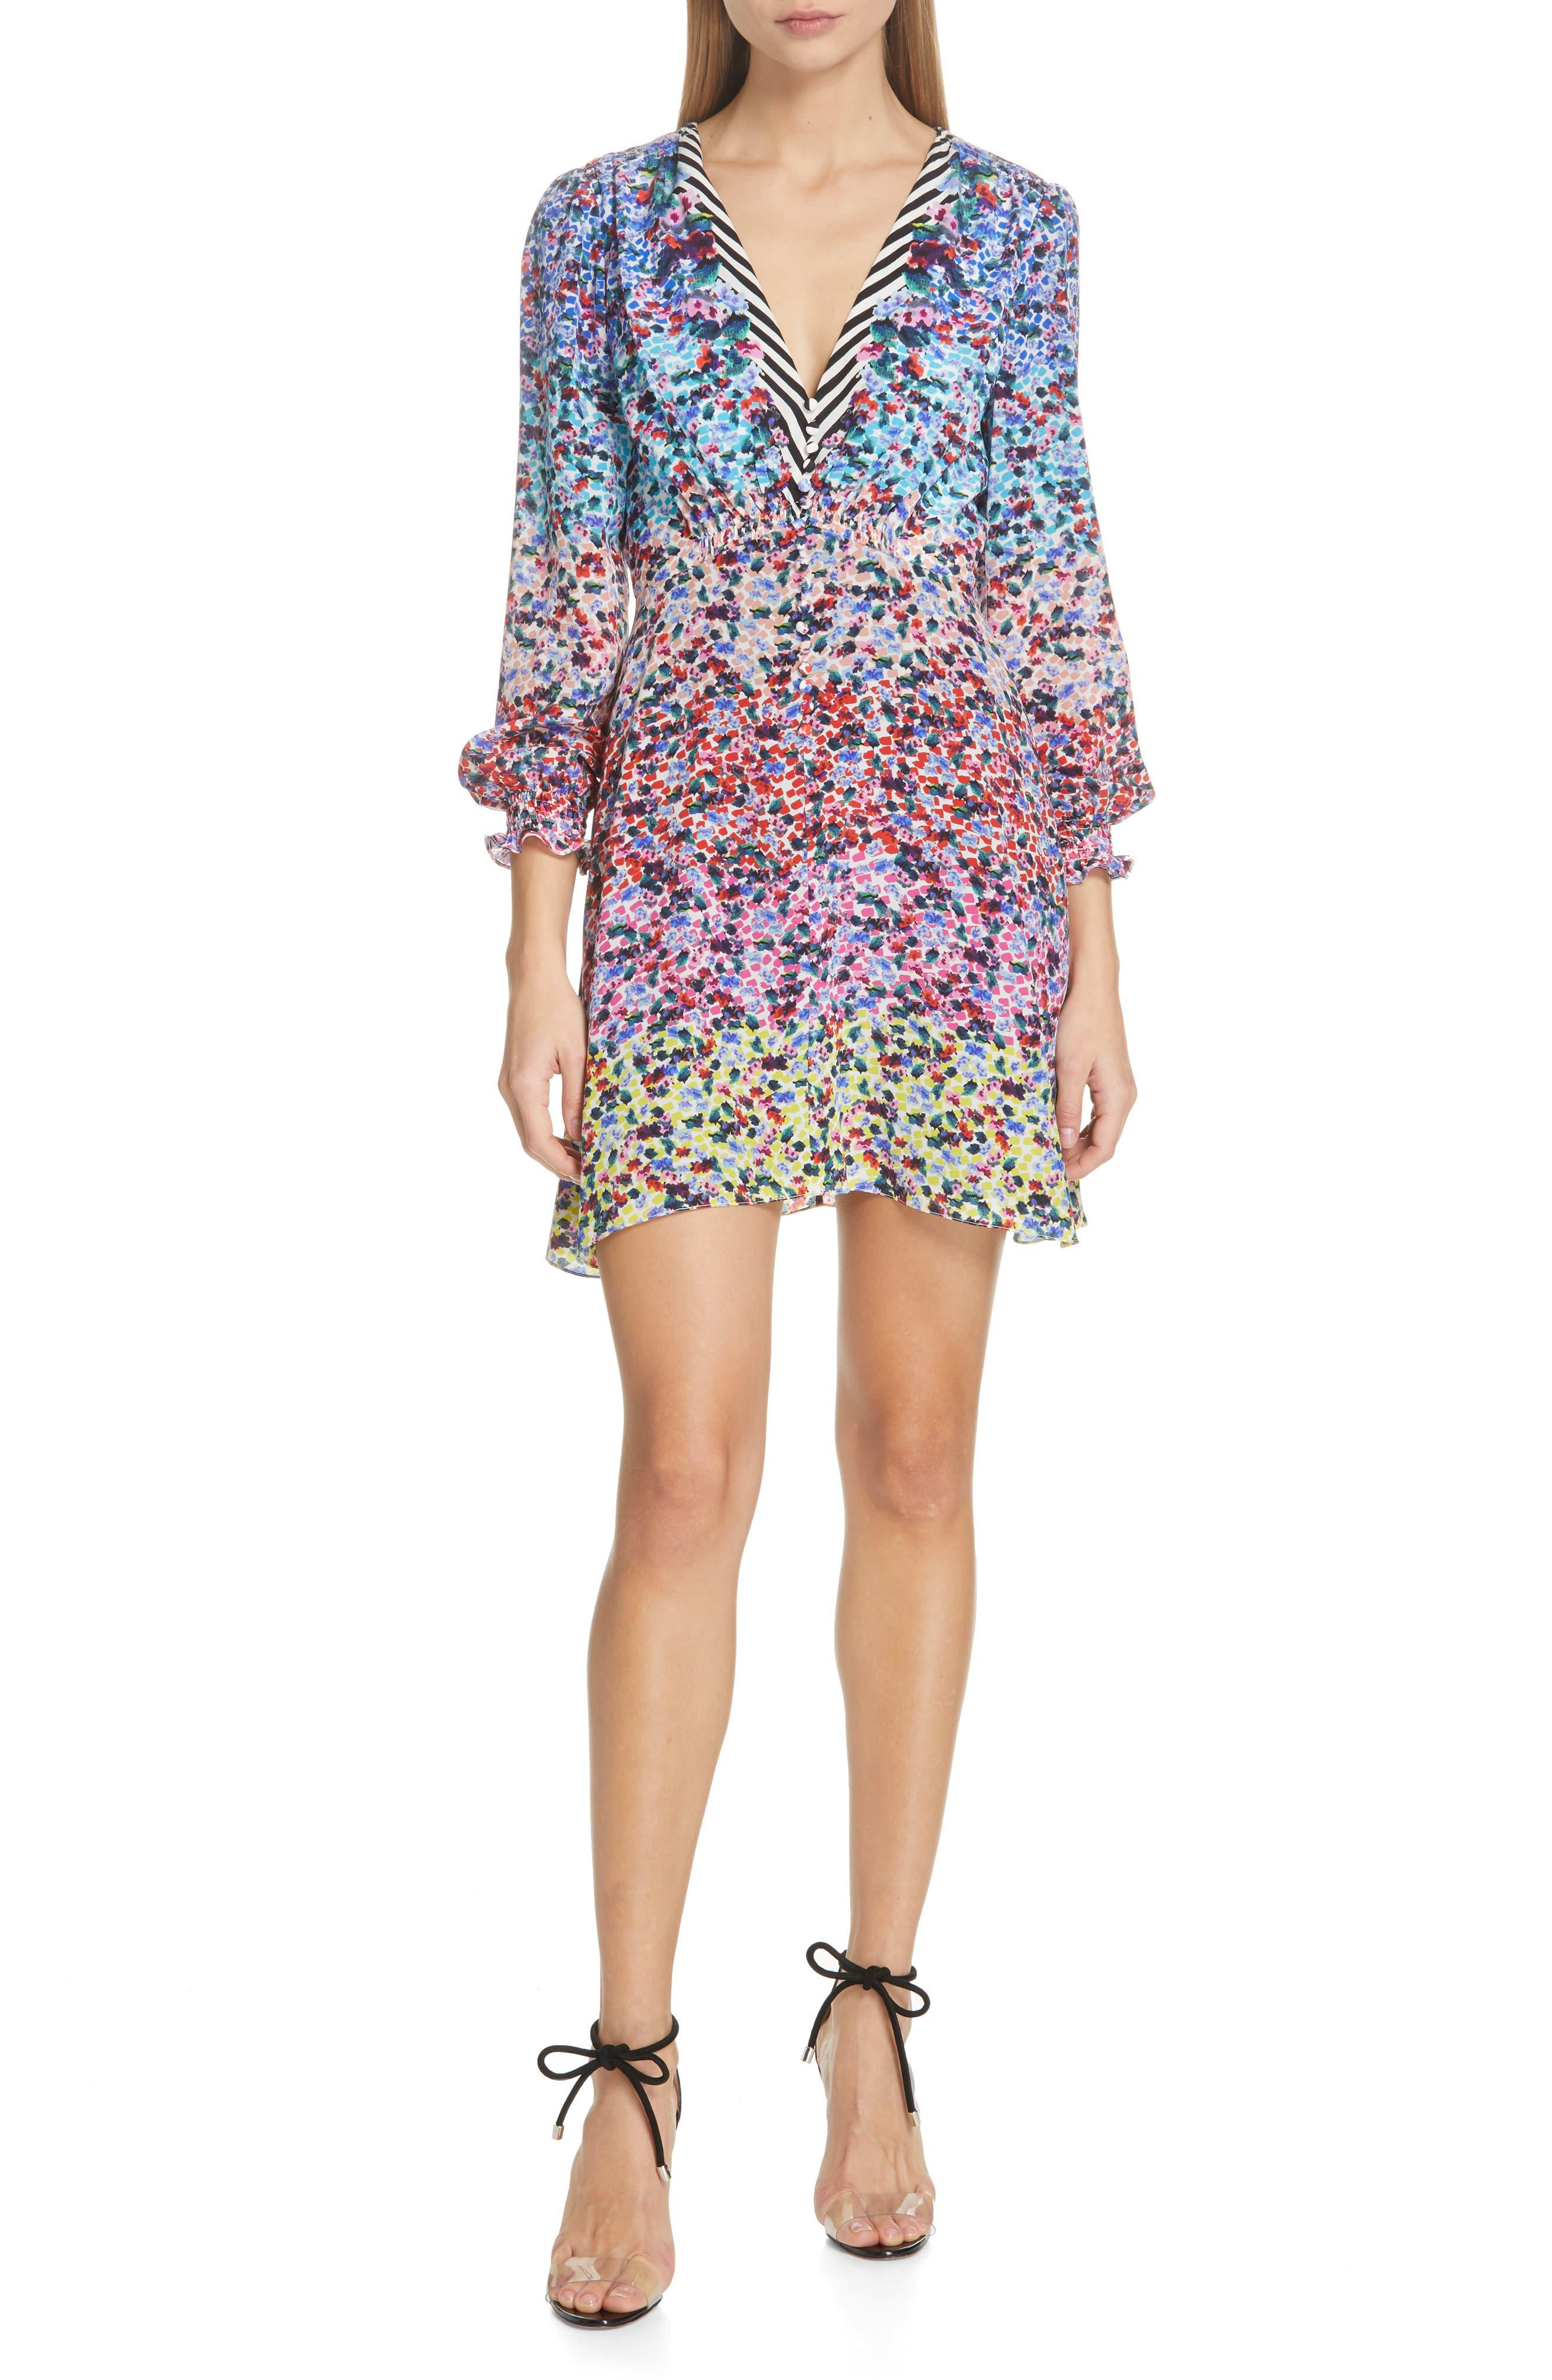 SALONI Eve Floral Print Dress, Main, color, RAINBOW GARDENIA PLMT